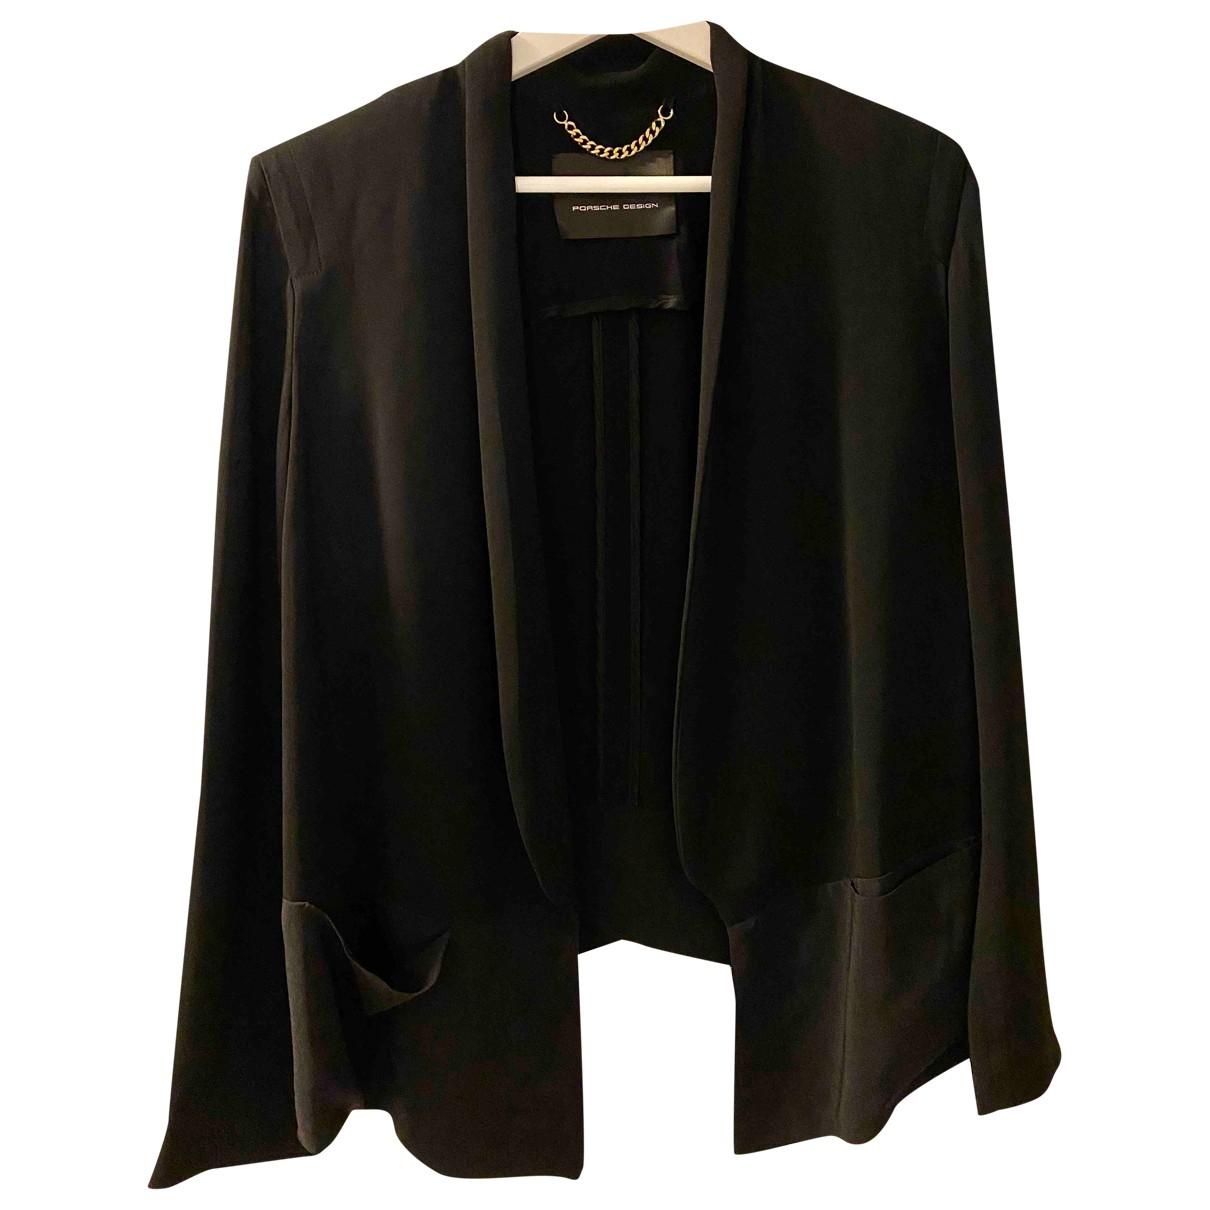 Porsche Design \N Black jacket for Women S International